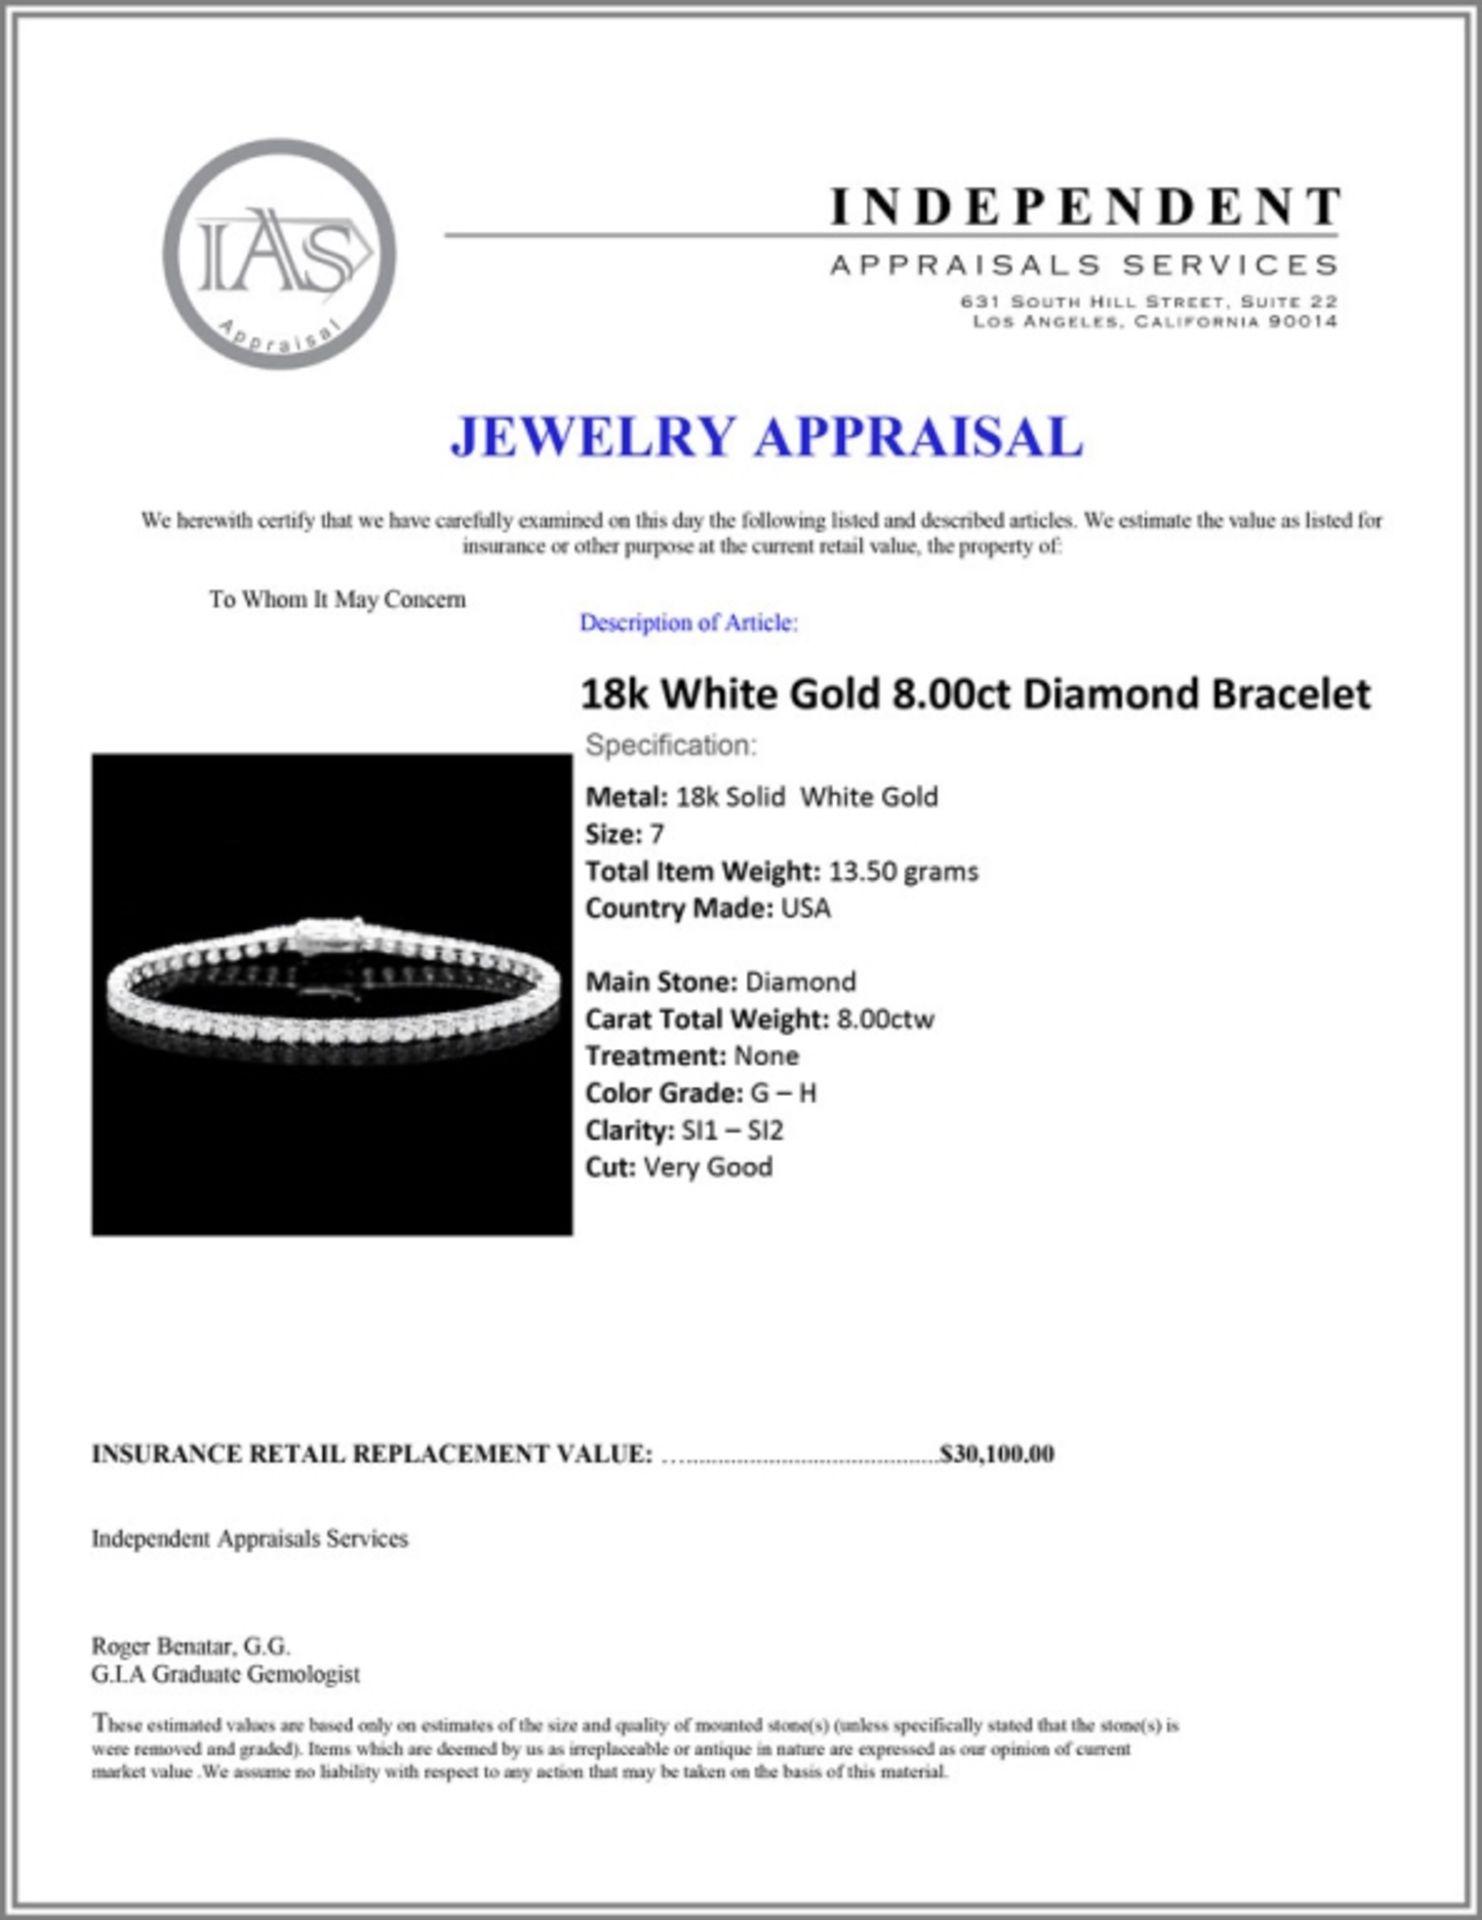 18k White Gold 8.00ct Diamond Bracelet - Image 4 of 4